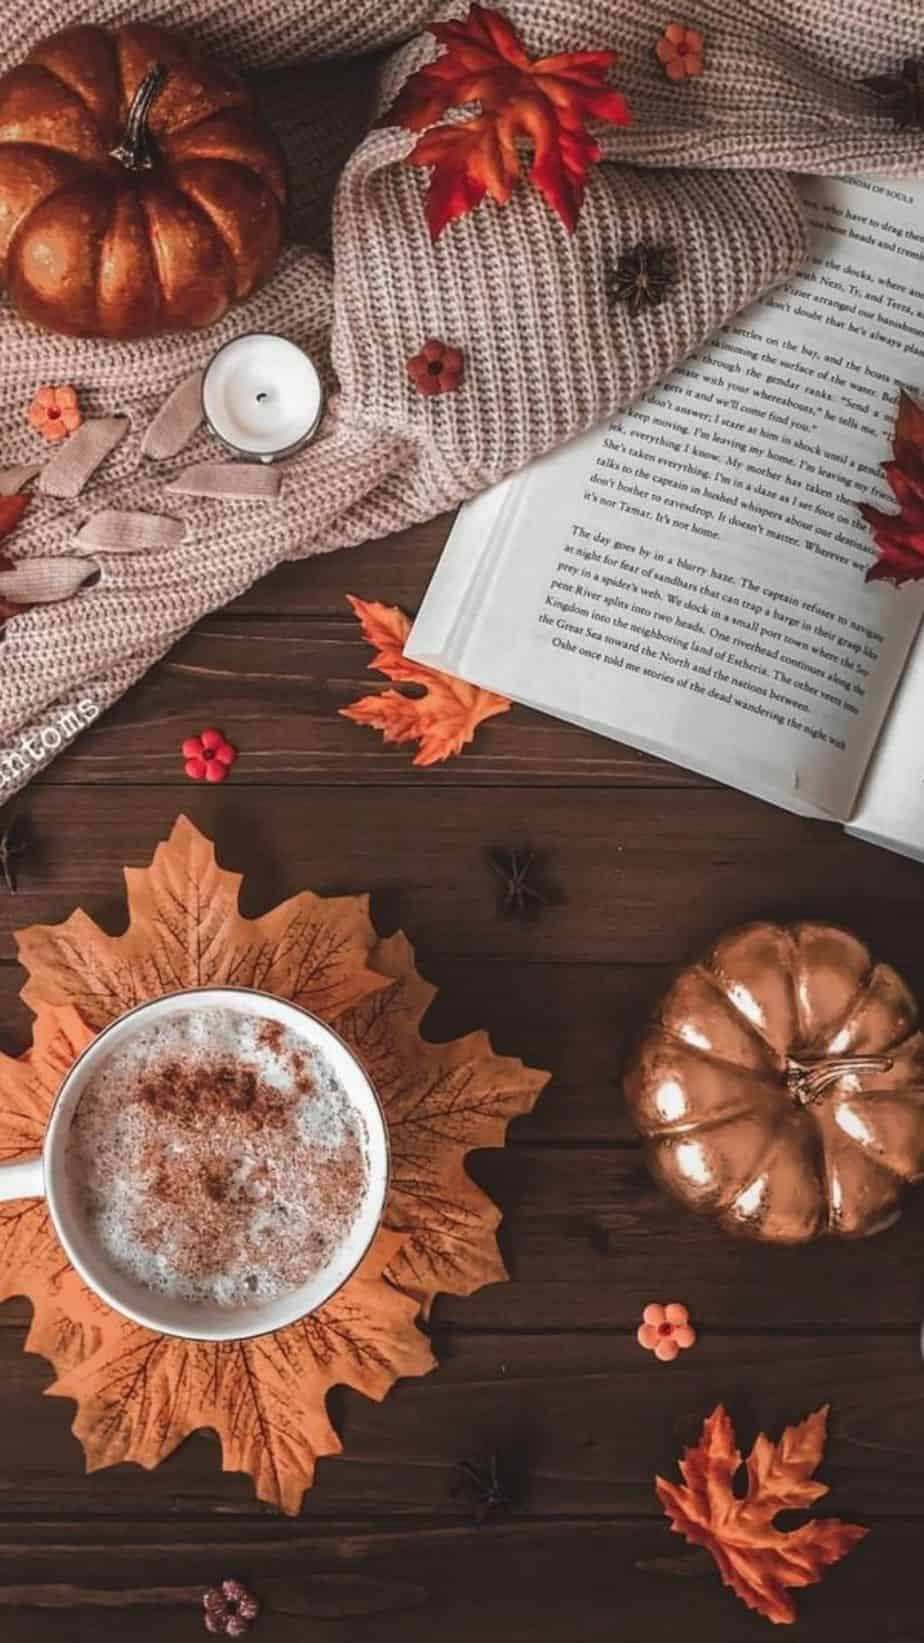 Relaxing Fall Wallpaper